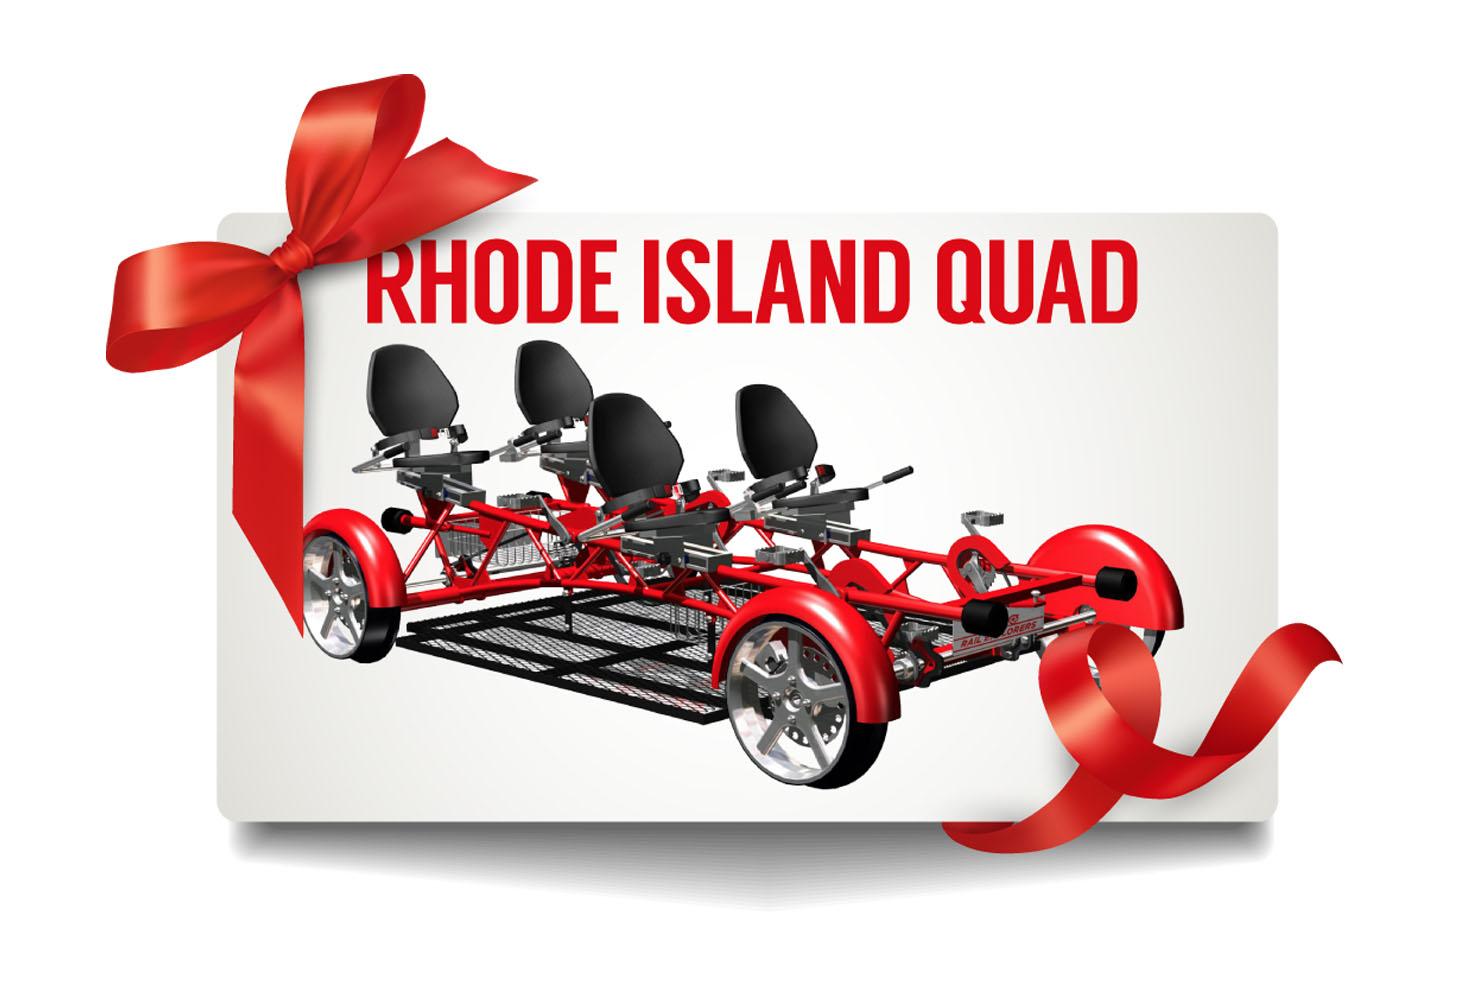 Gift Card: Rhode Island Quad $150